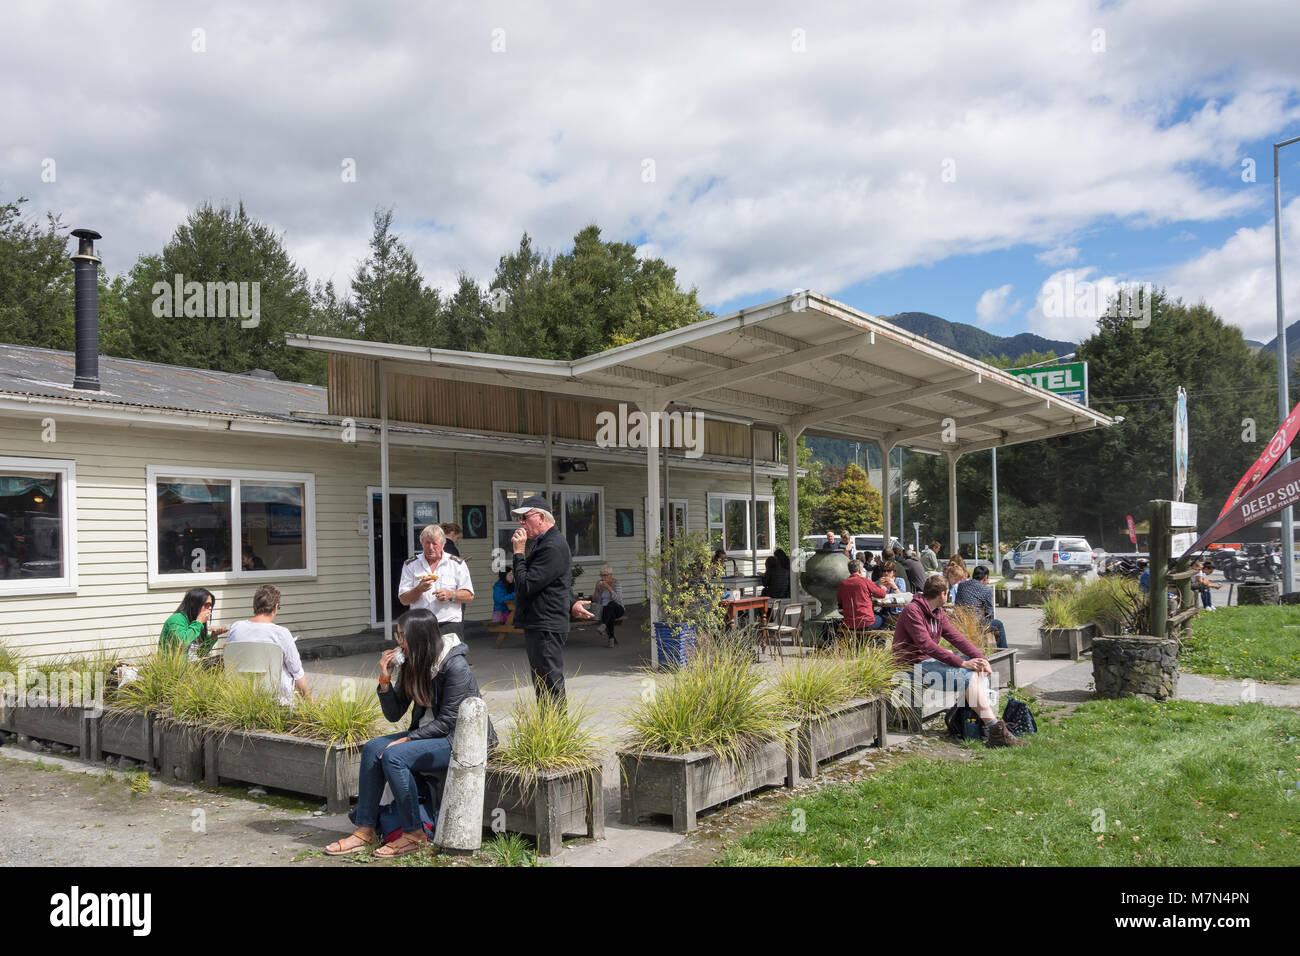 Alpine Motor Inn & Cafe, Springs Junction, State Highway 7, Maruia, West Coast Region, New Zealand - Stock Image